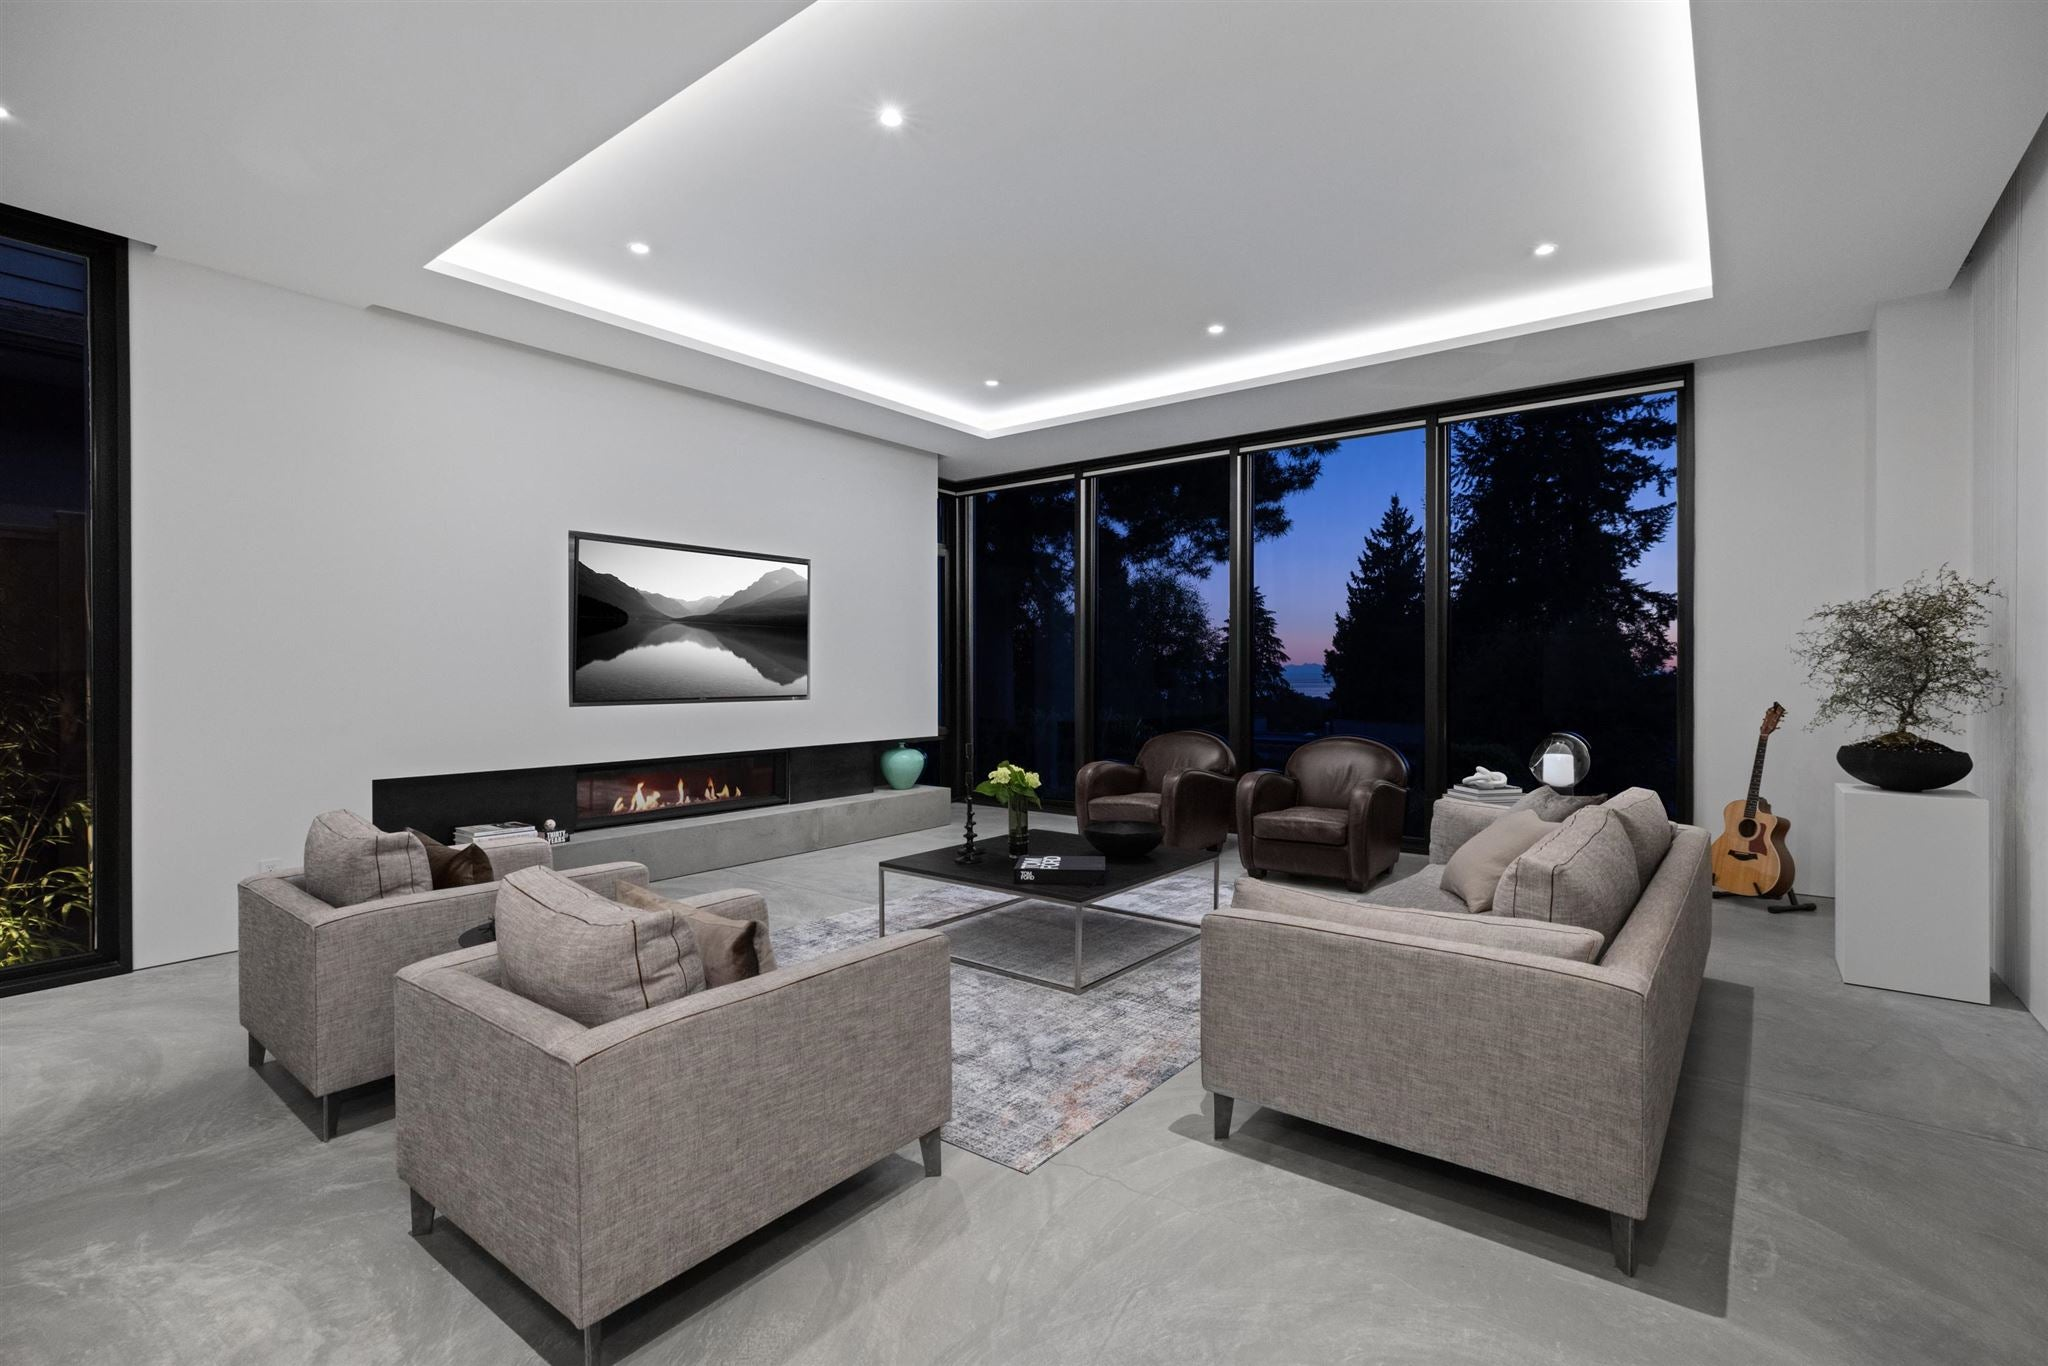 276 SANDRINGHAM CRESCENT - Upper Lonsdale House/Single Family for sale, 7 Bedrooms (R2617703) - #6